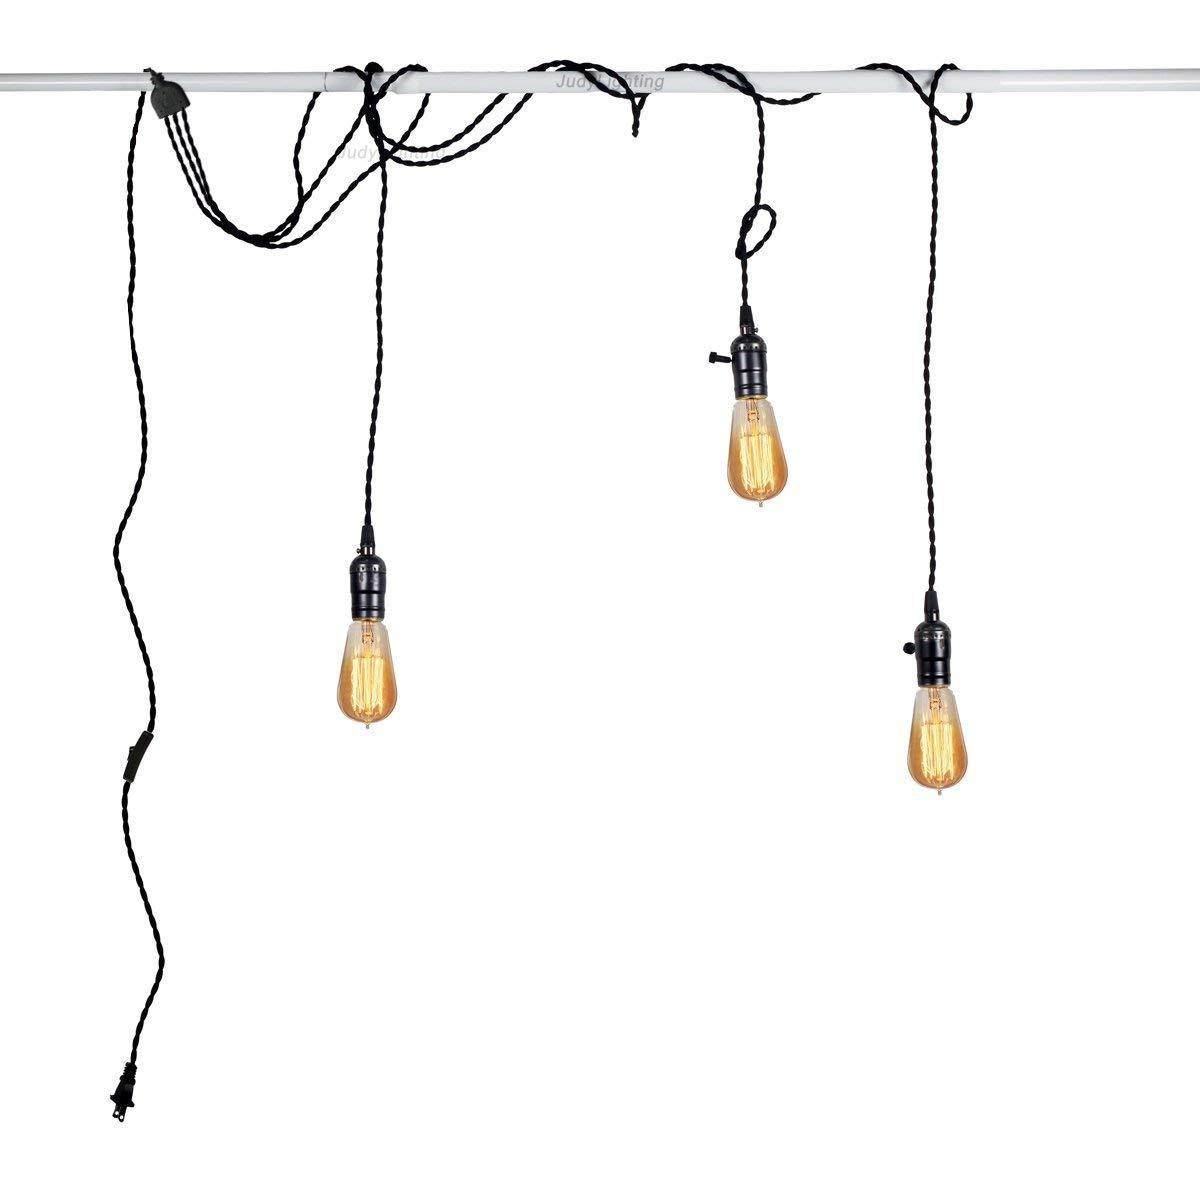 3 Light Vintage Pendant Light Kit Plug in Hanging Lighting Fixture 24.5FT Cord Set, Triple Socket Chandelier Swag Lights with 4 Hook Sets & On/Off Switch for Edison Bulb (Pearl Black)